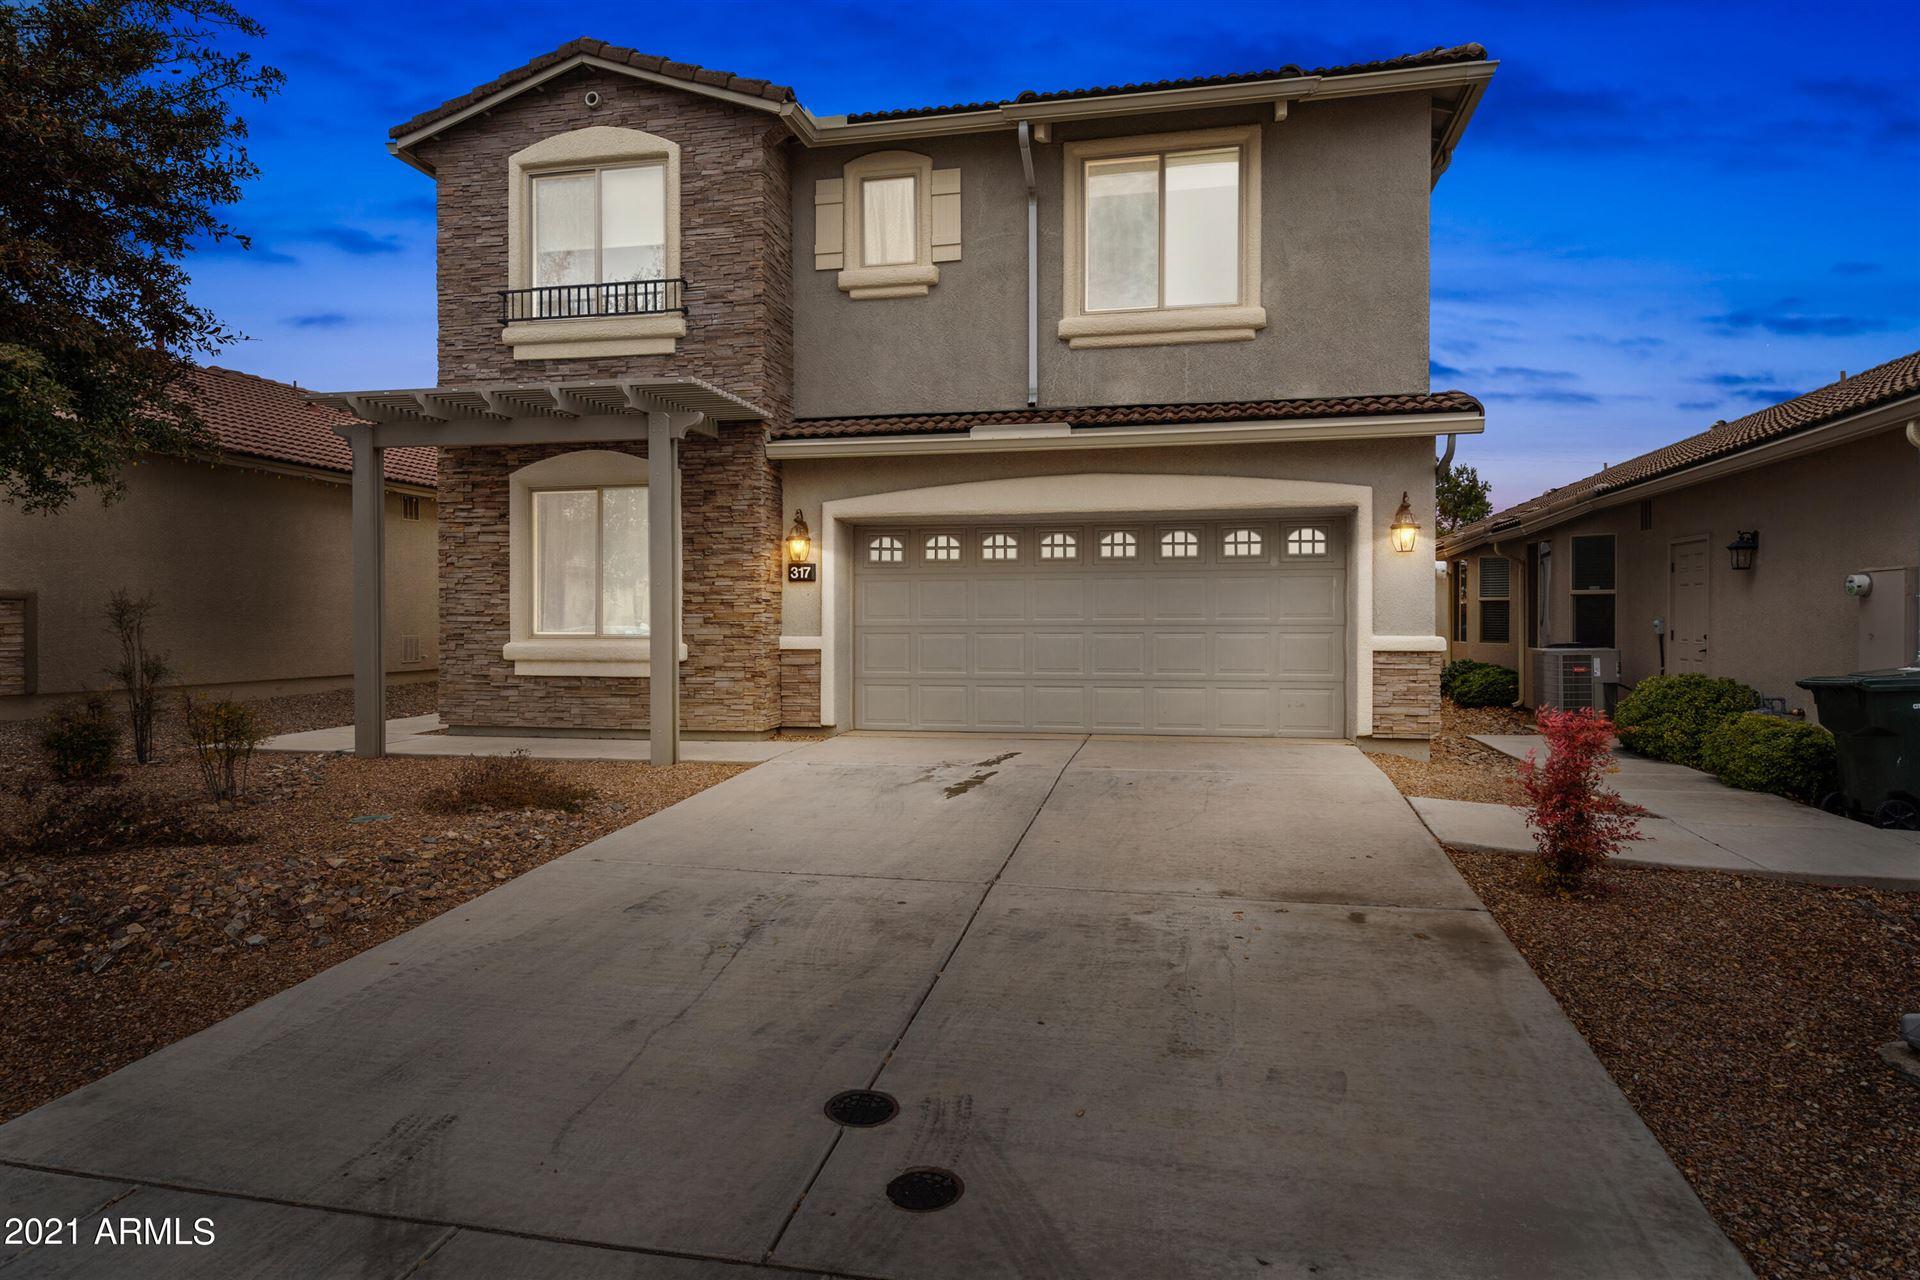 317 BAINBRIDGE Drive, Sierra Vista, AZ 85635 - MLS#: 6201076